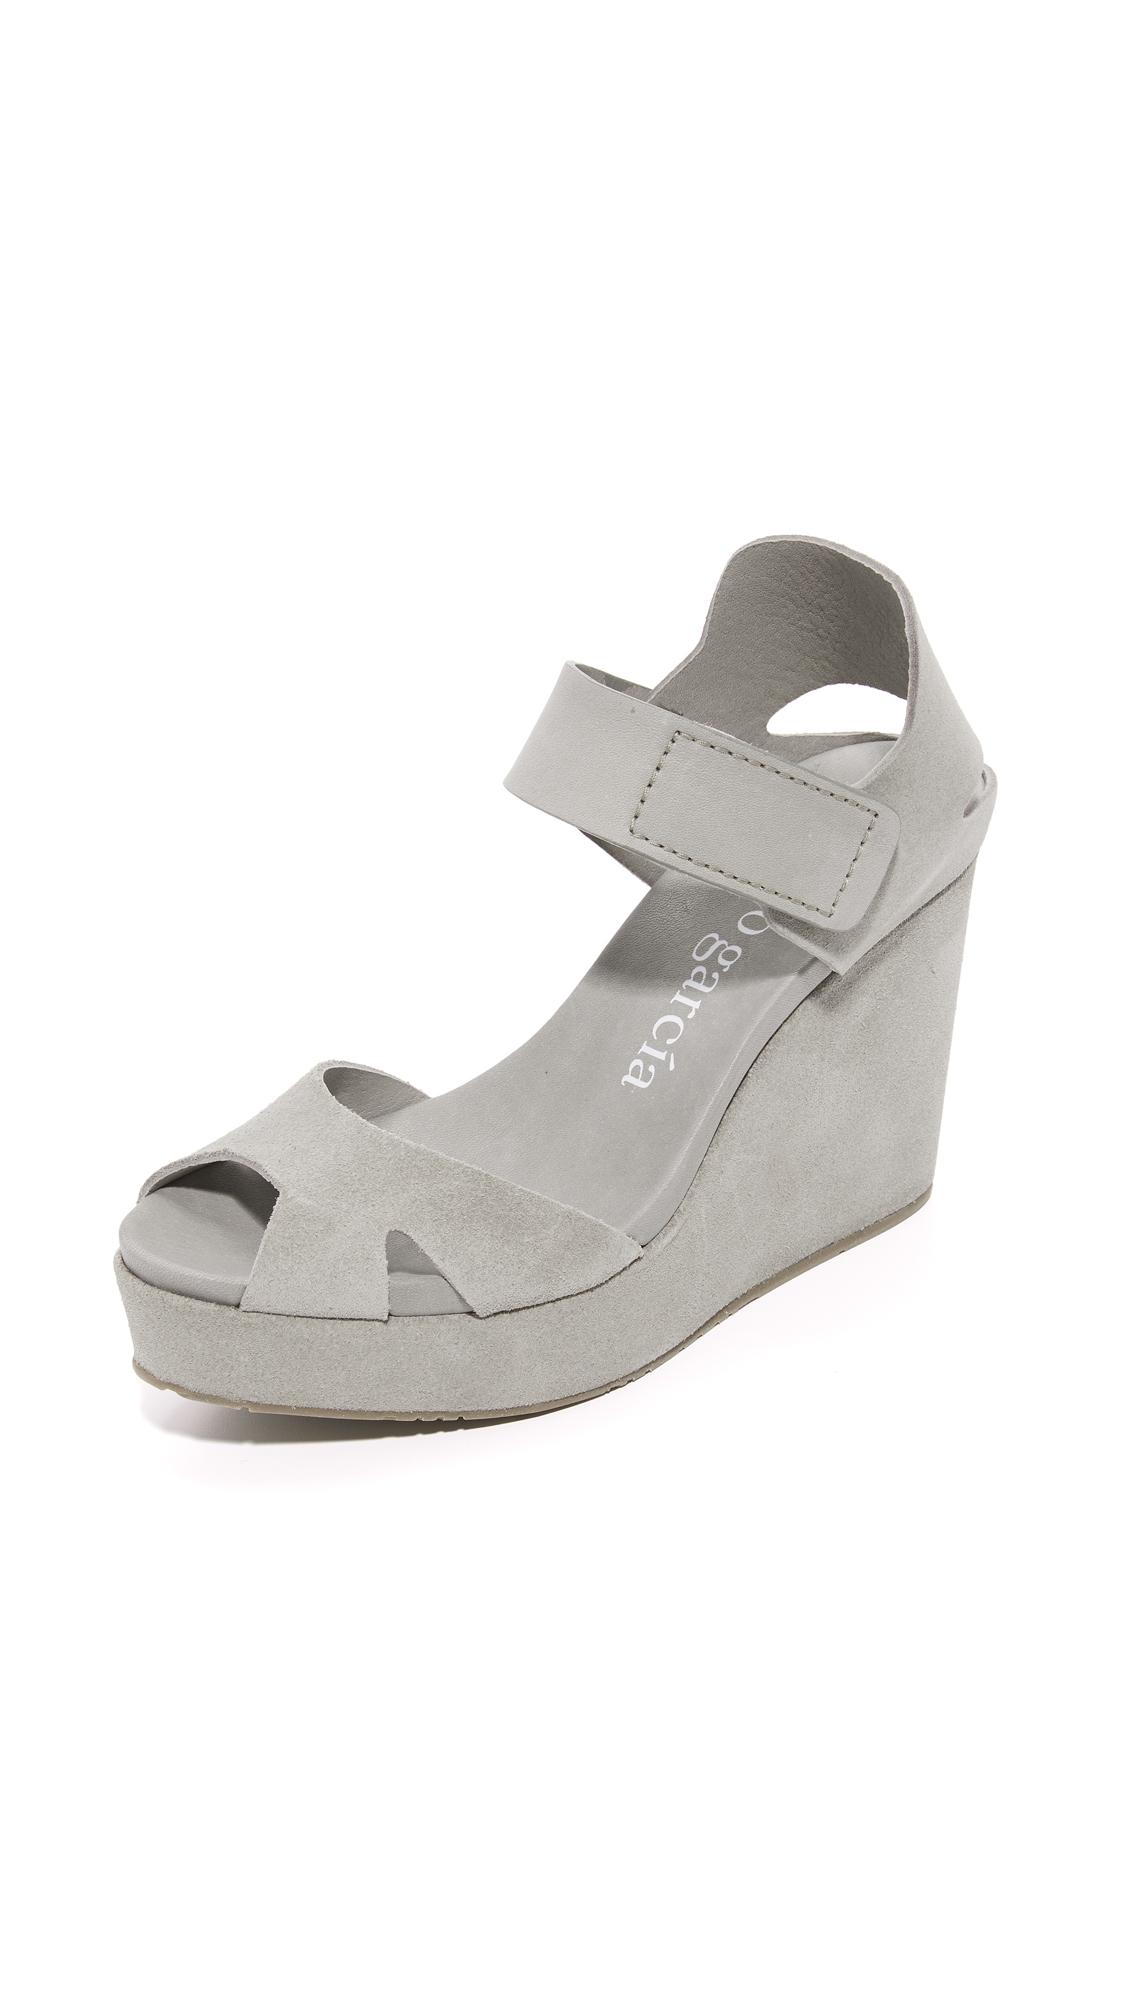 Pedro Garcia Malu Wedge Sandals - Pumice